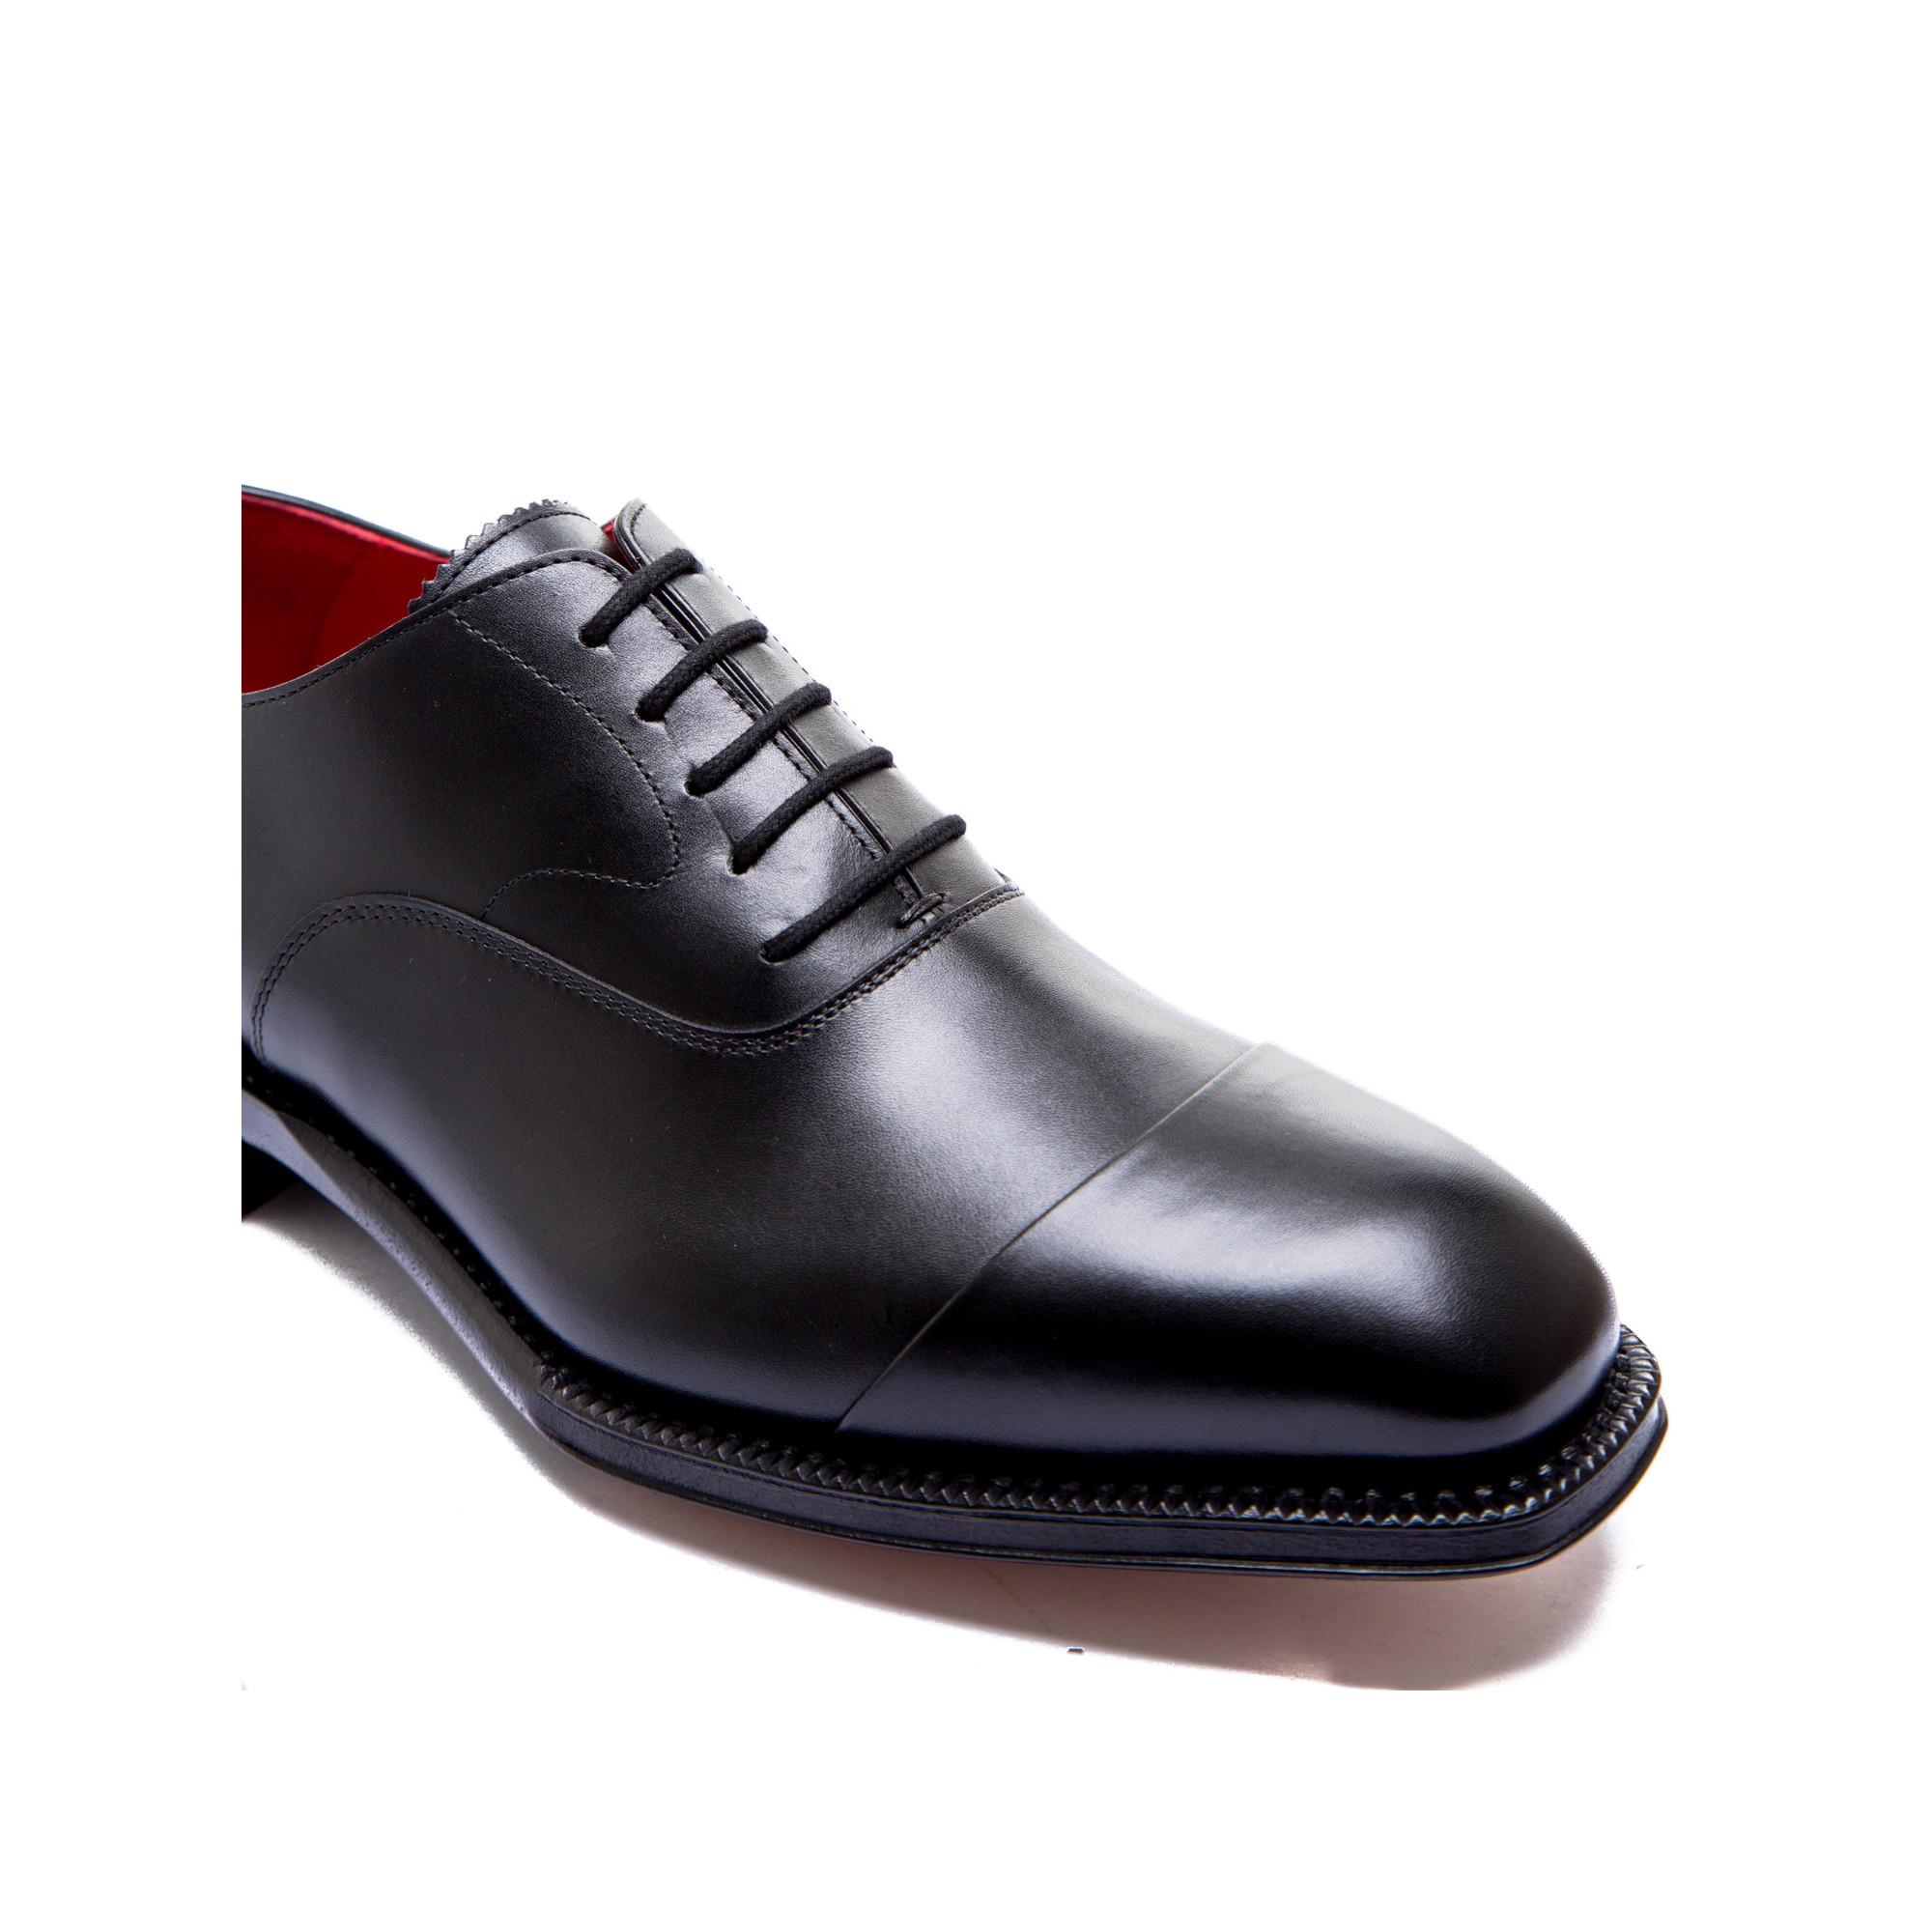 Alexander Mcqueen Shoes | Derodeloper.com